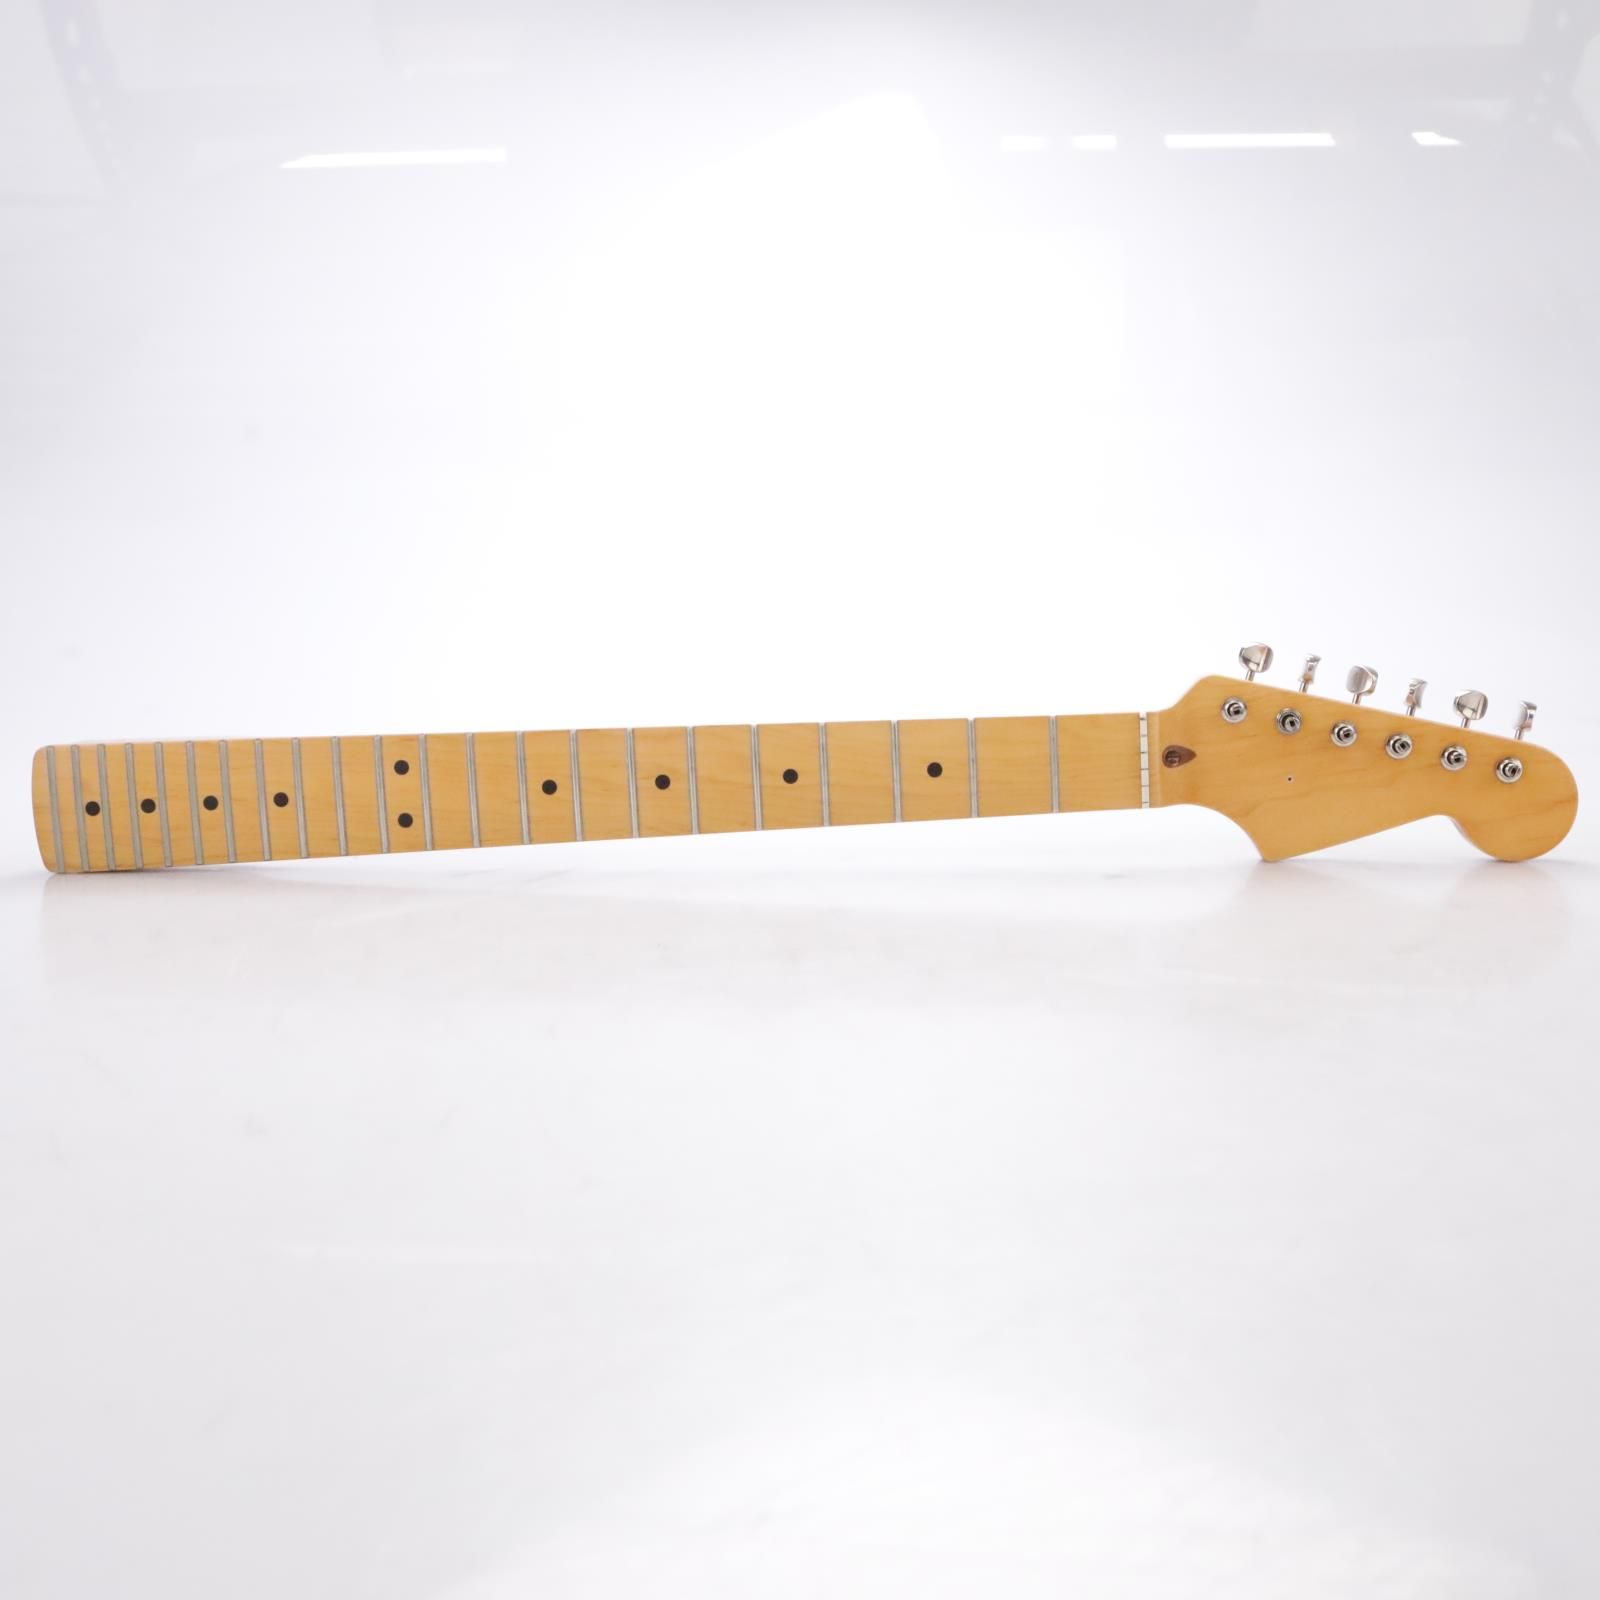 "Warmoth ""59 Roundback"" 22 Fret Maple Stratocaster Neck w/Tuners #44295"